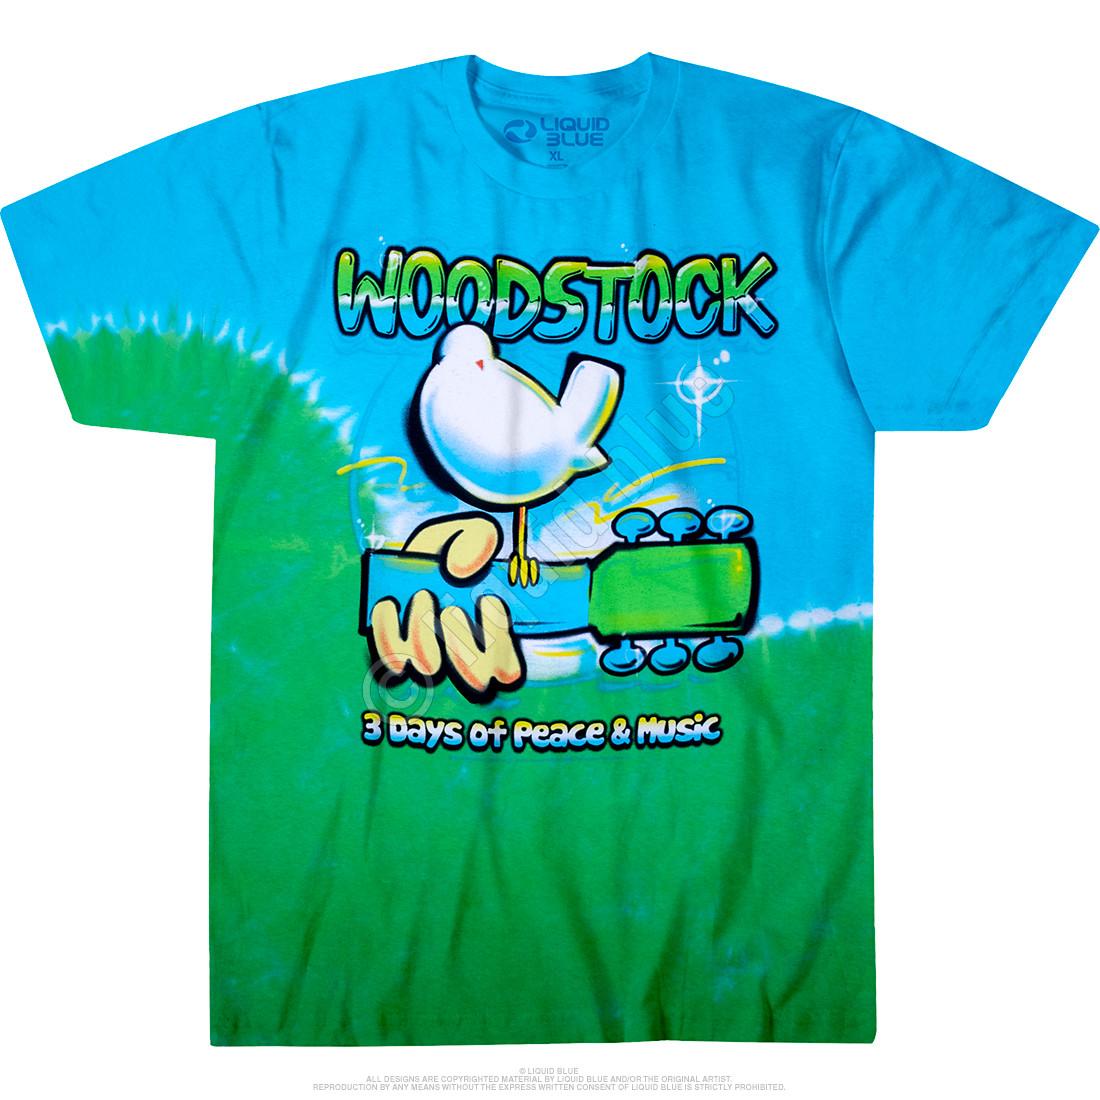 Woodstock Graffiti Tie-Dye T-Shirt